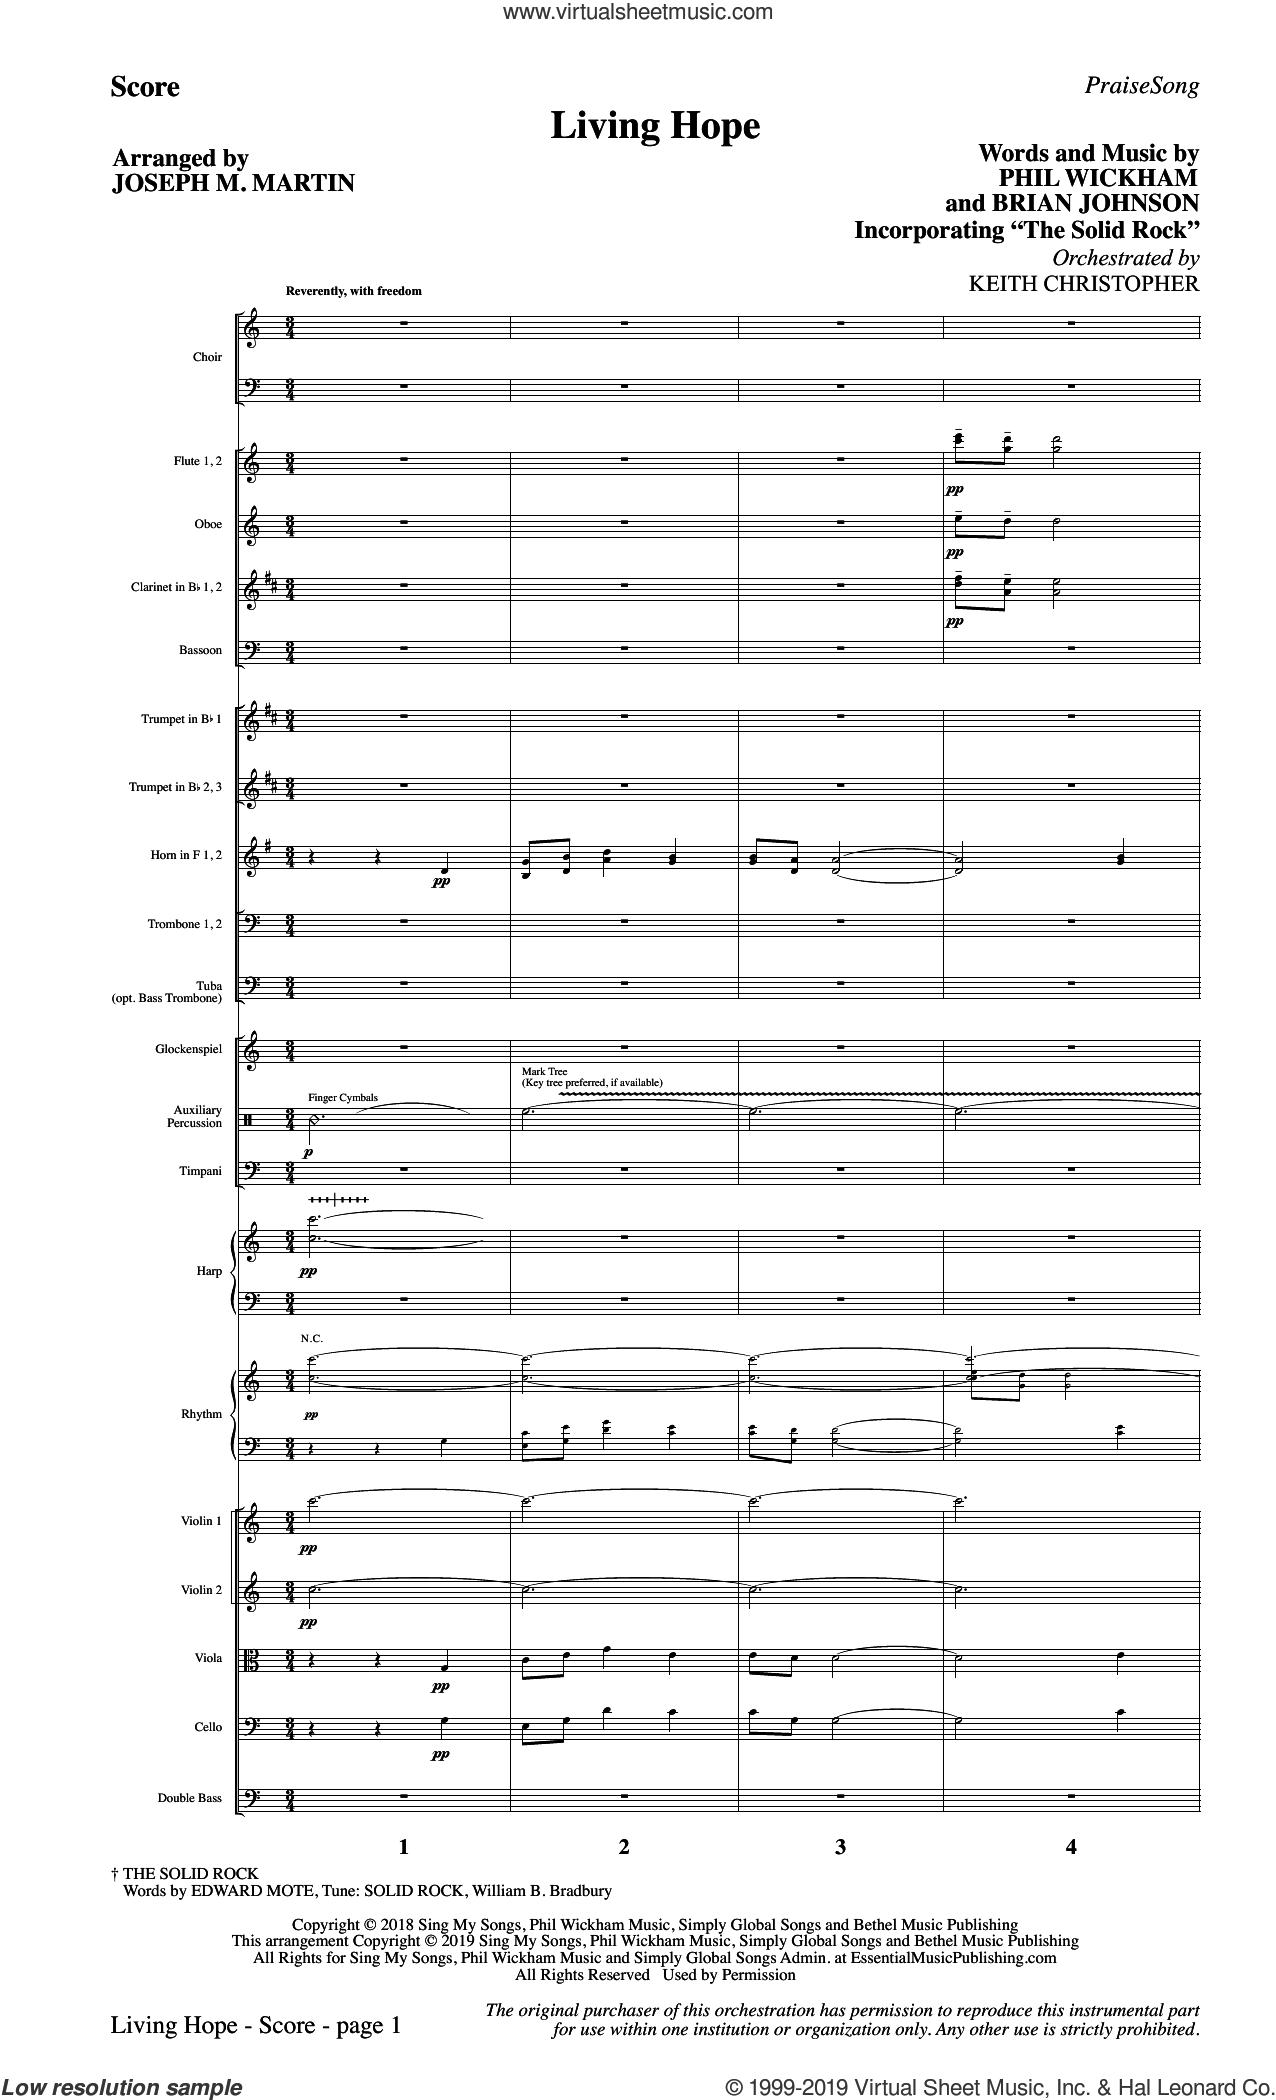 Living Hope (arr. Joseph M. Martin) (COMPLETE) sheet music for orchestra/band by Joseph M. Martin, Brian Johnson and Phil Wickham, intermediate skill level